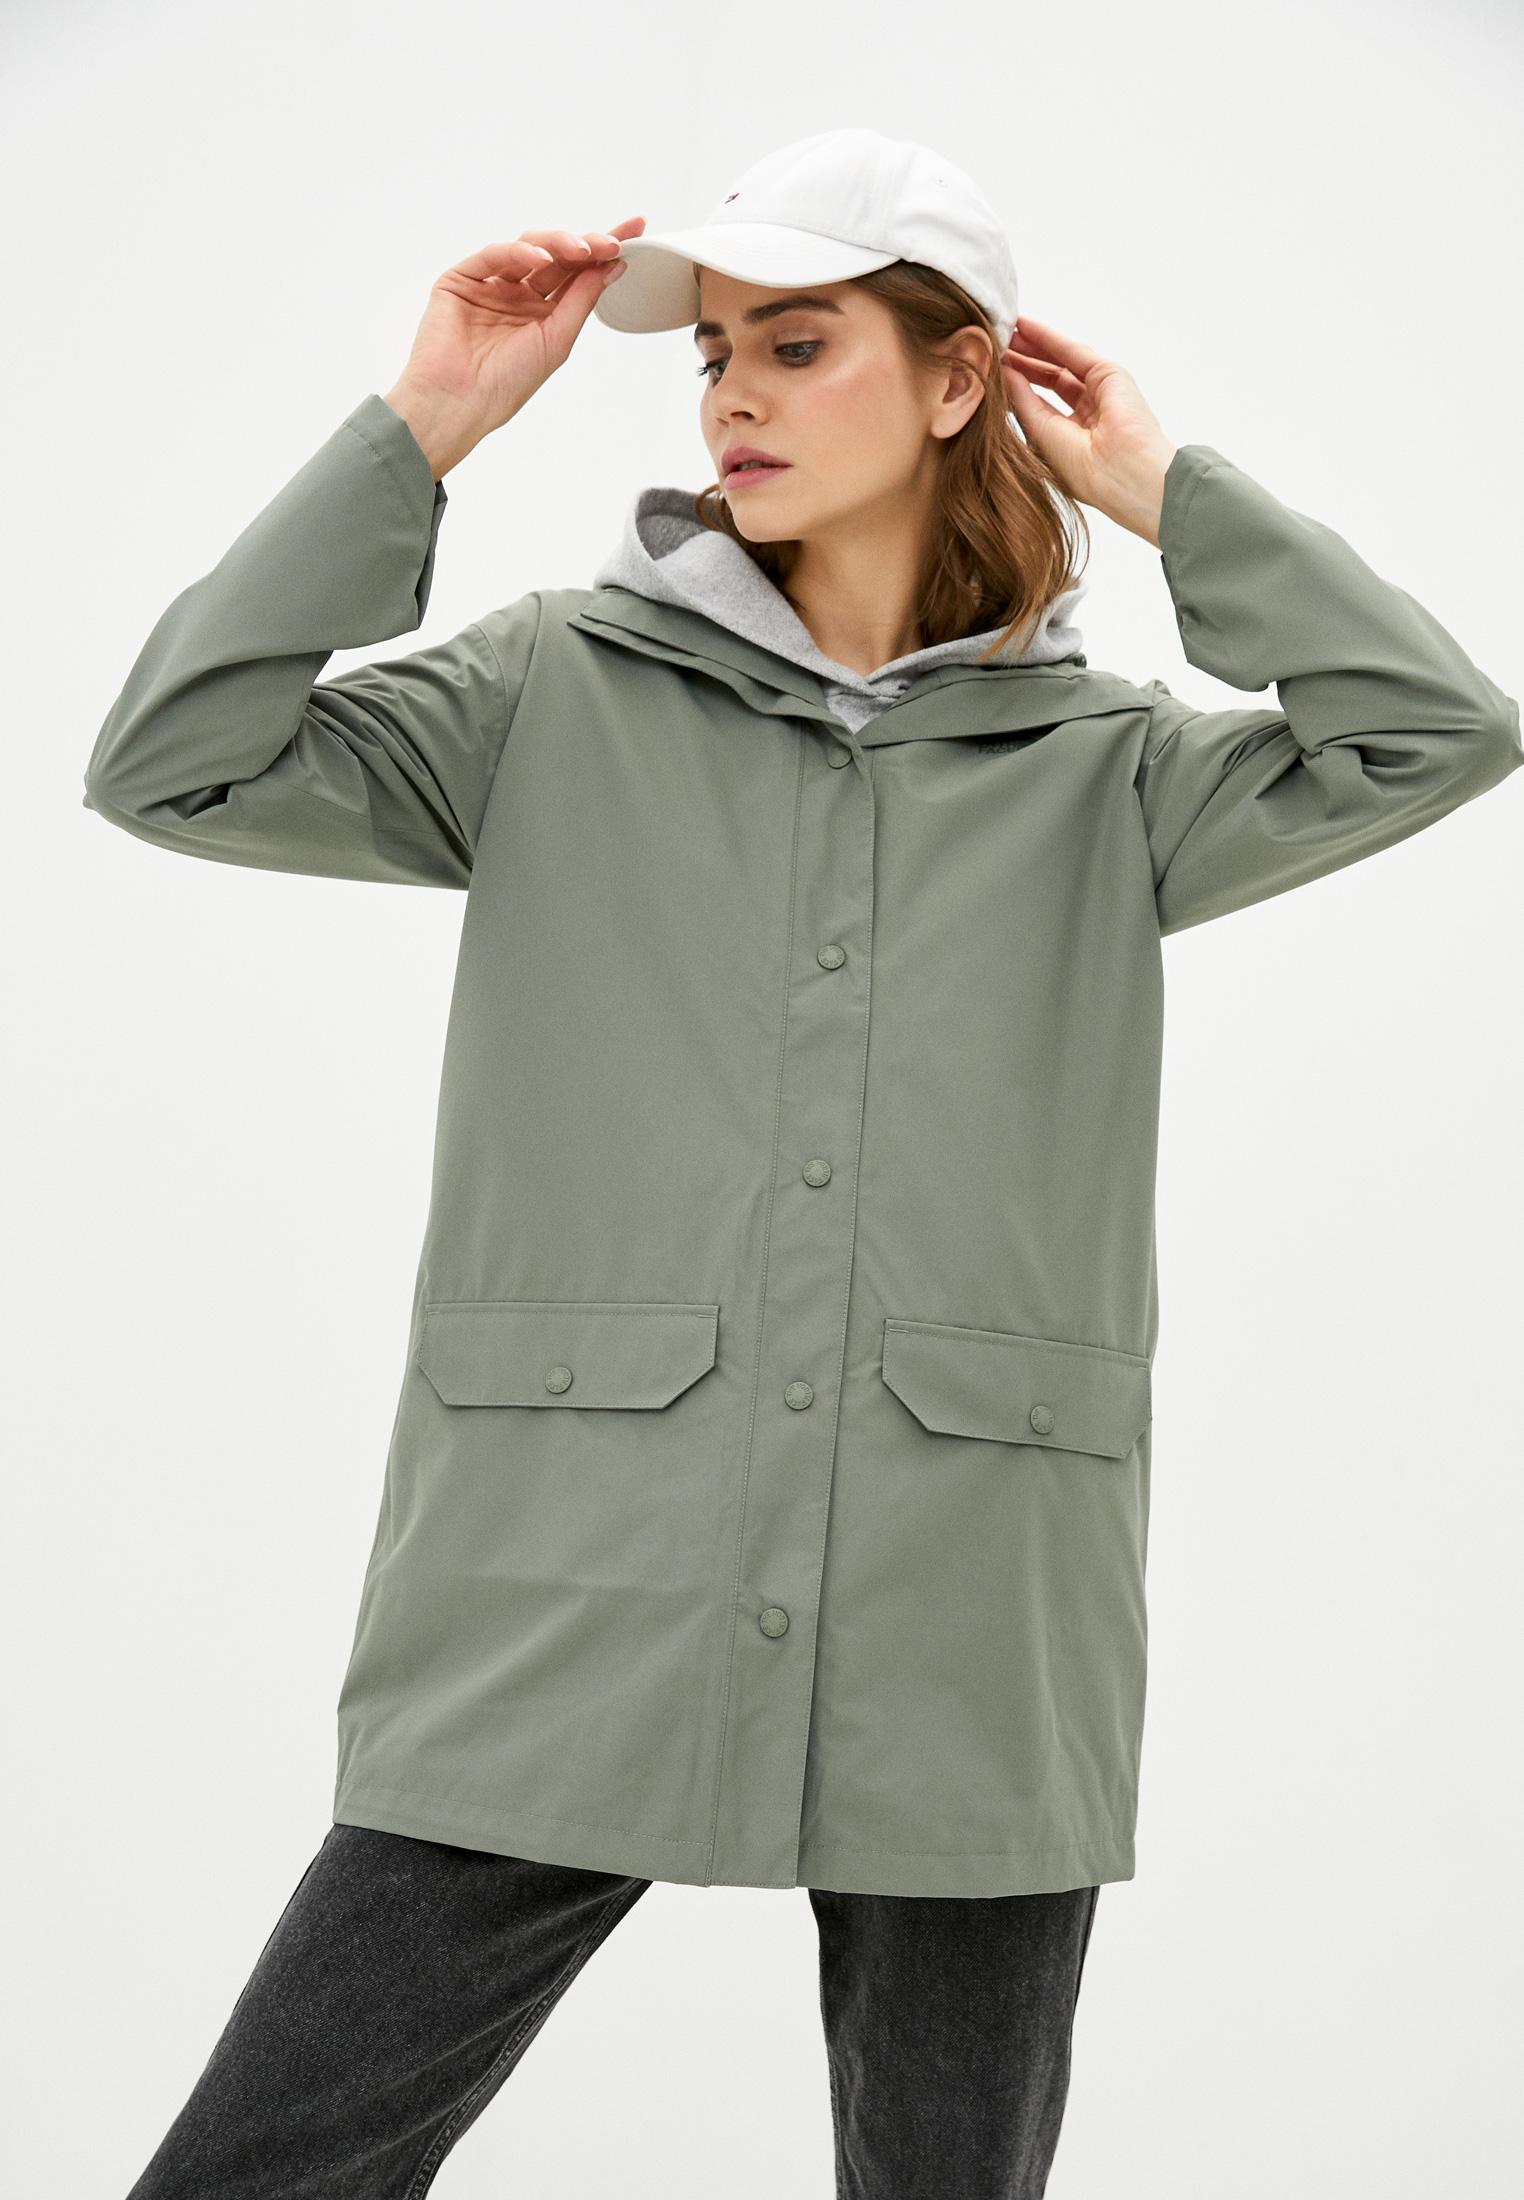 Женская верхняя одежда The North Face (Зе Норт Фейс) TA4AG8